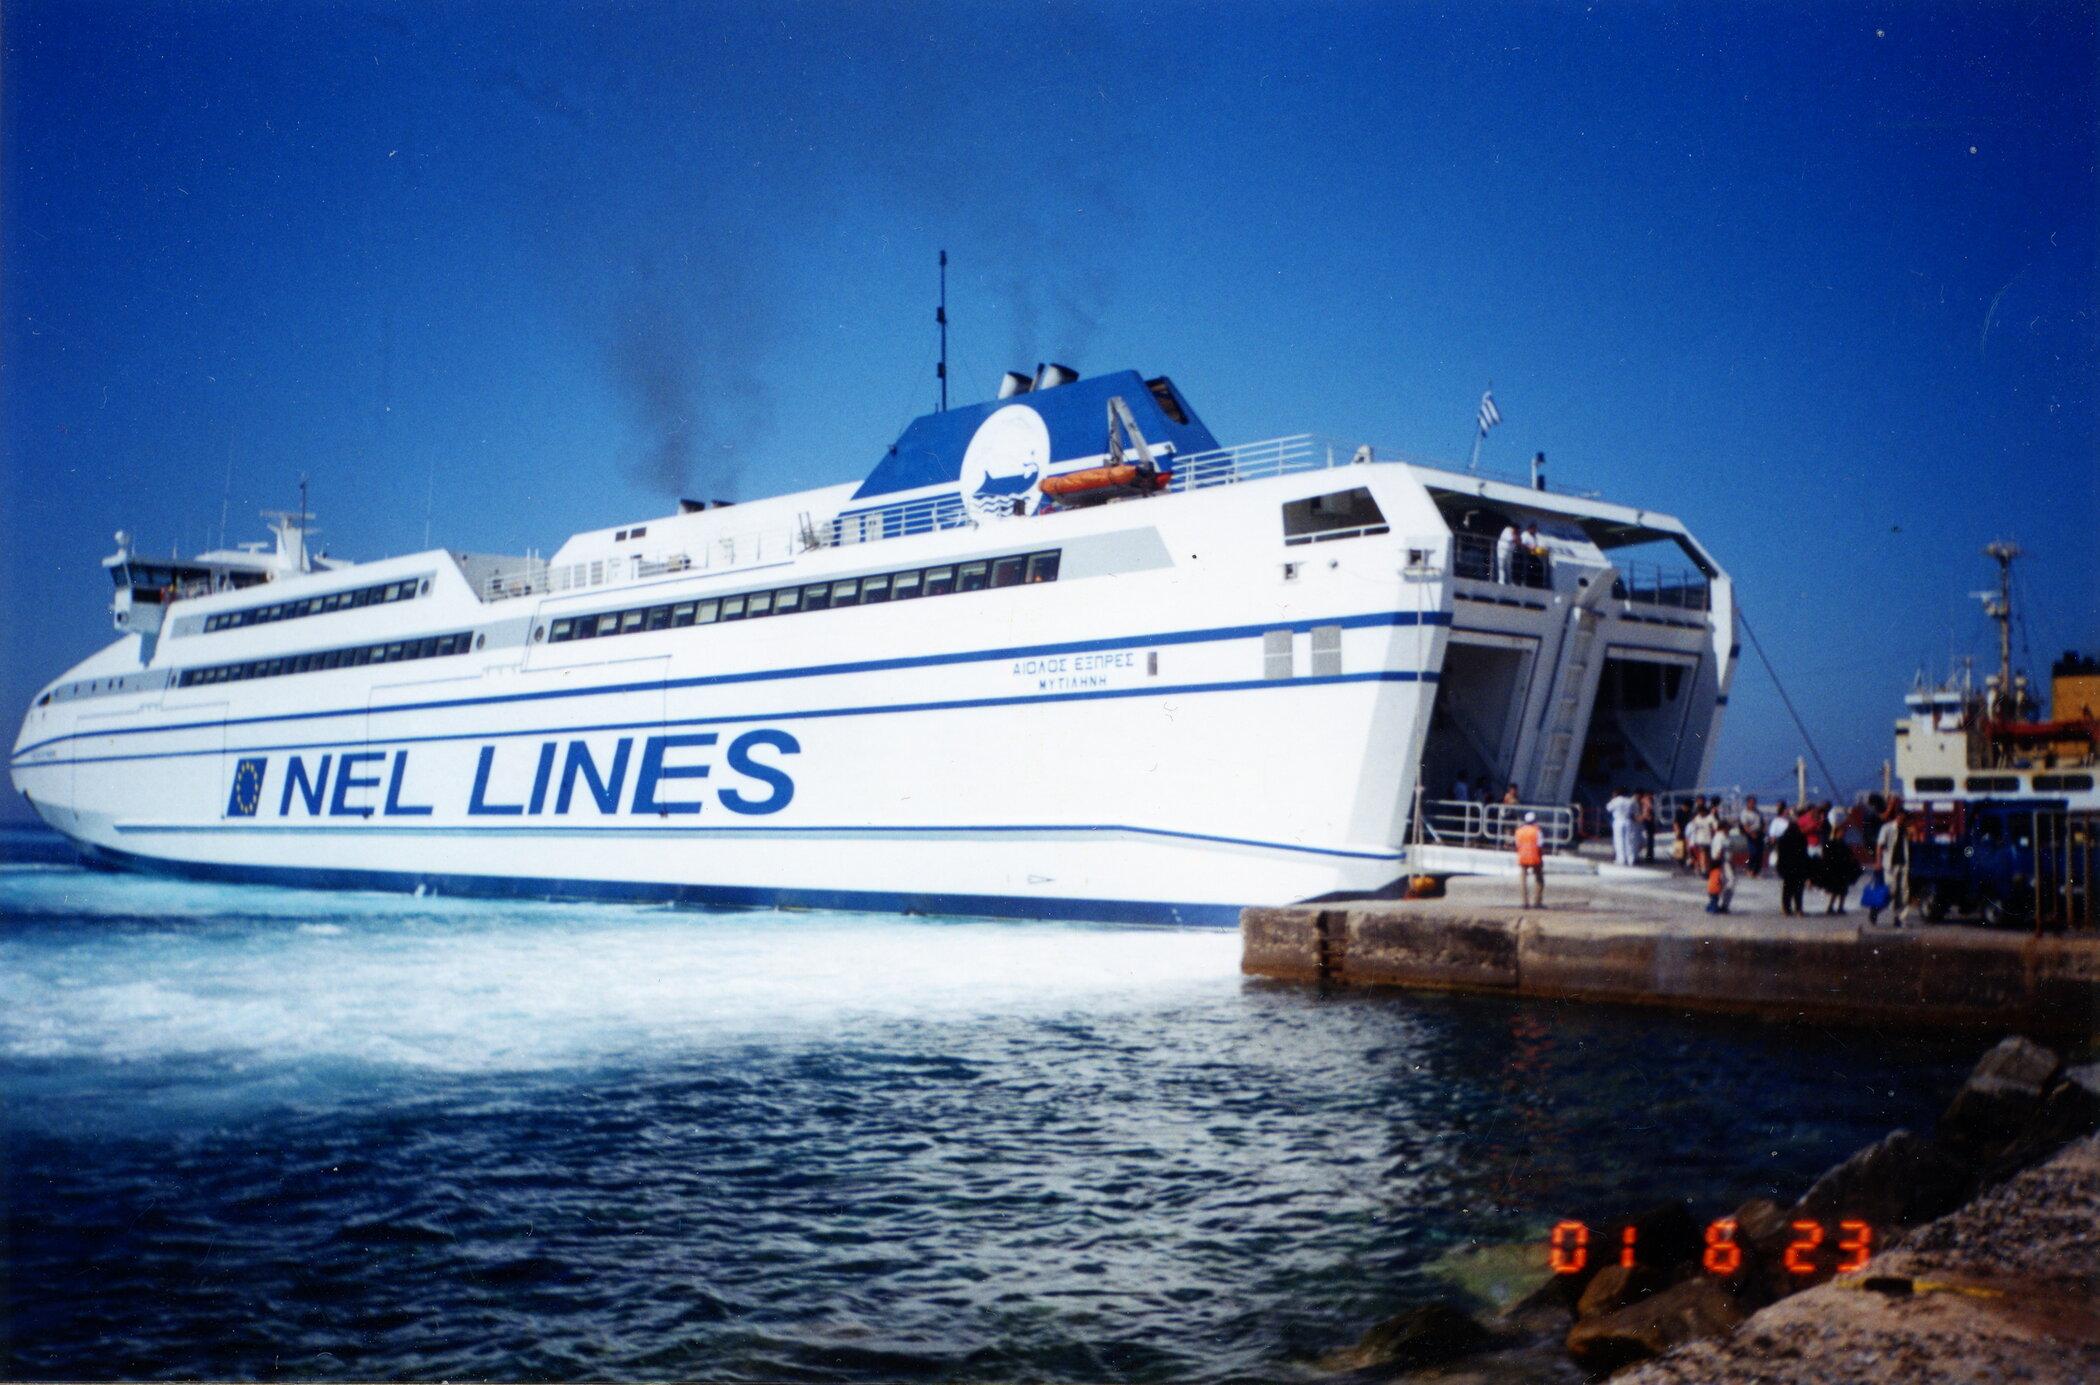 Aeolos Express